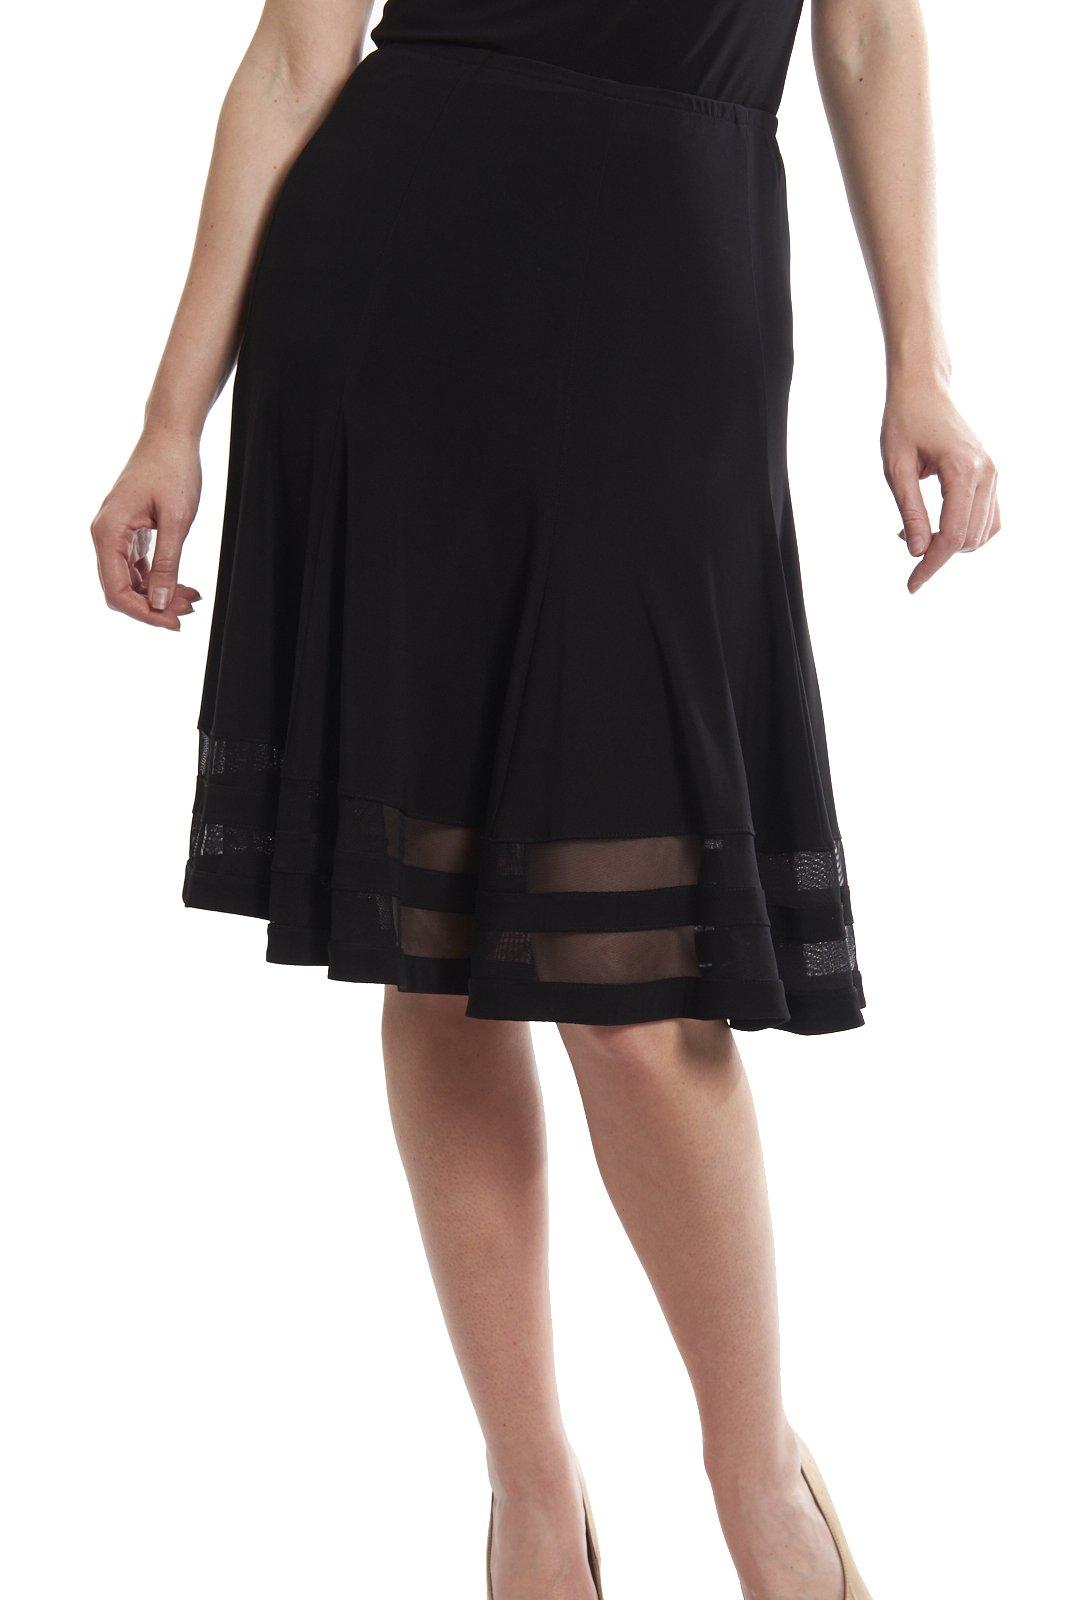 Joseph Ribkoff Black Sheer Striped Hem Knee Skirt Style 173152 - Size 12